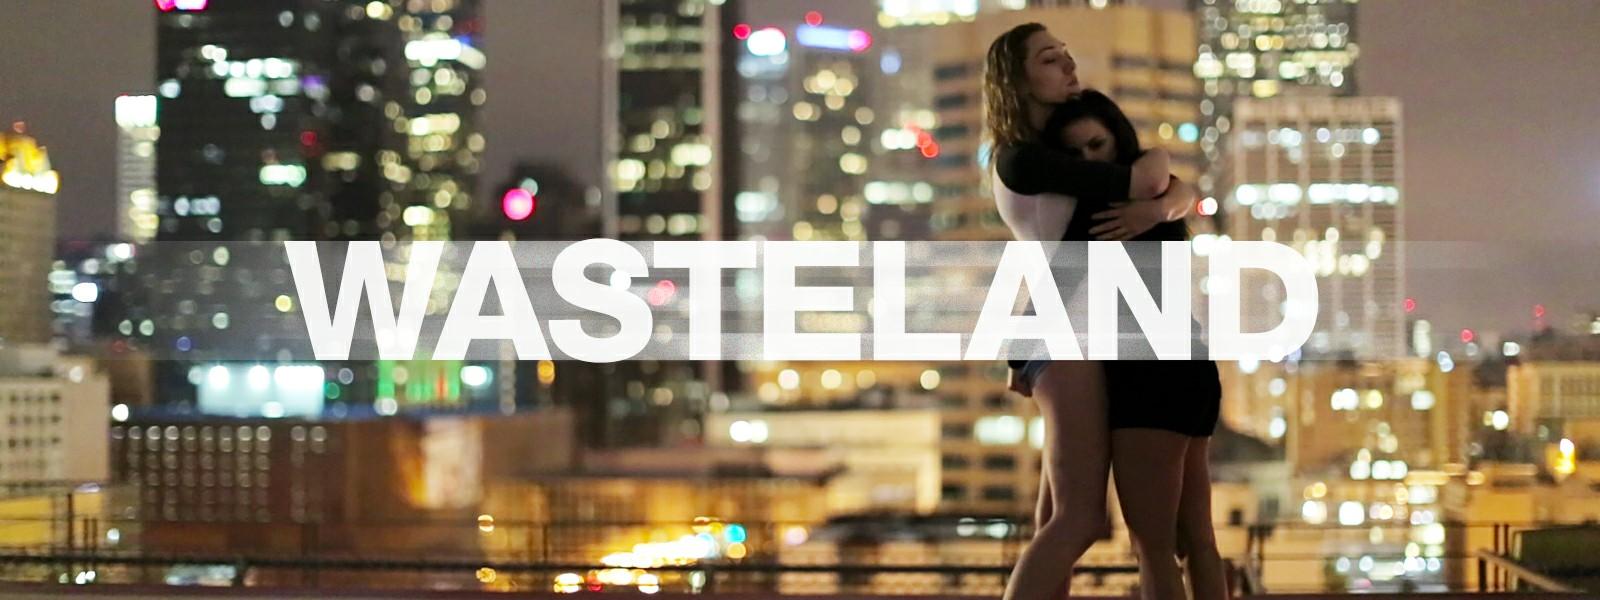 Wasteland Poster Image